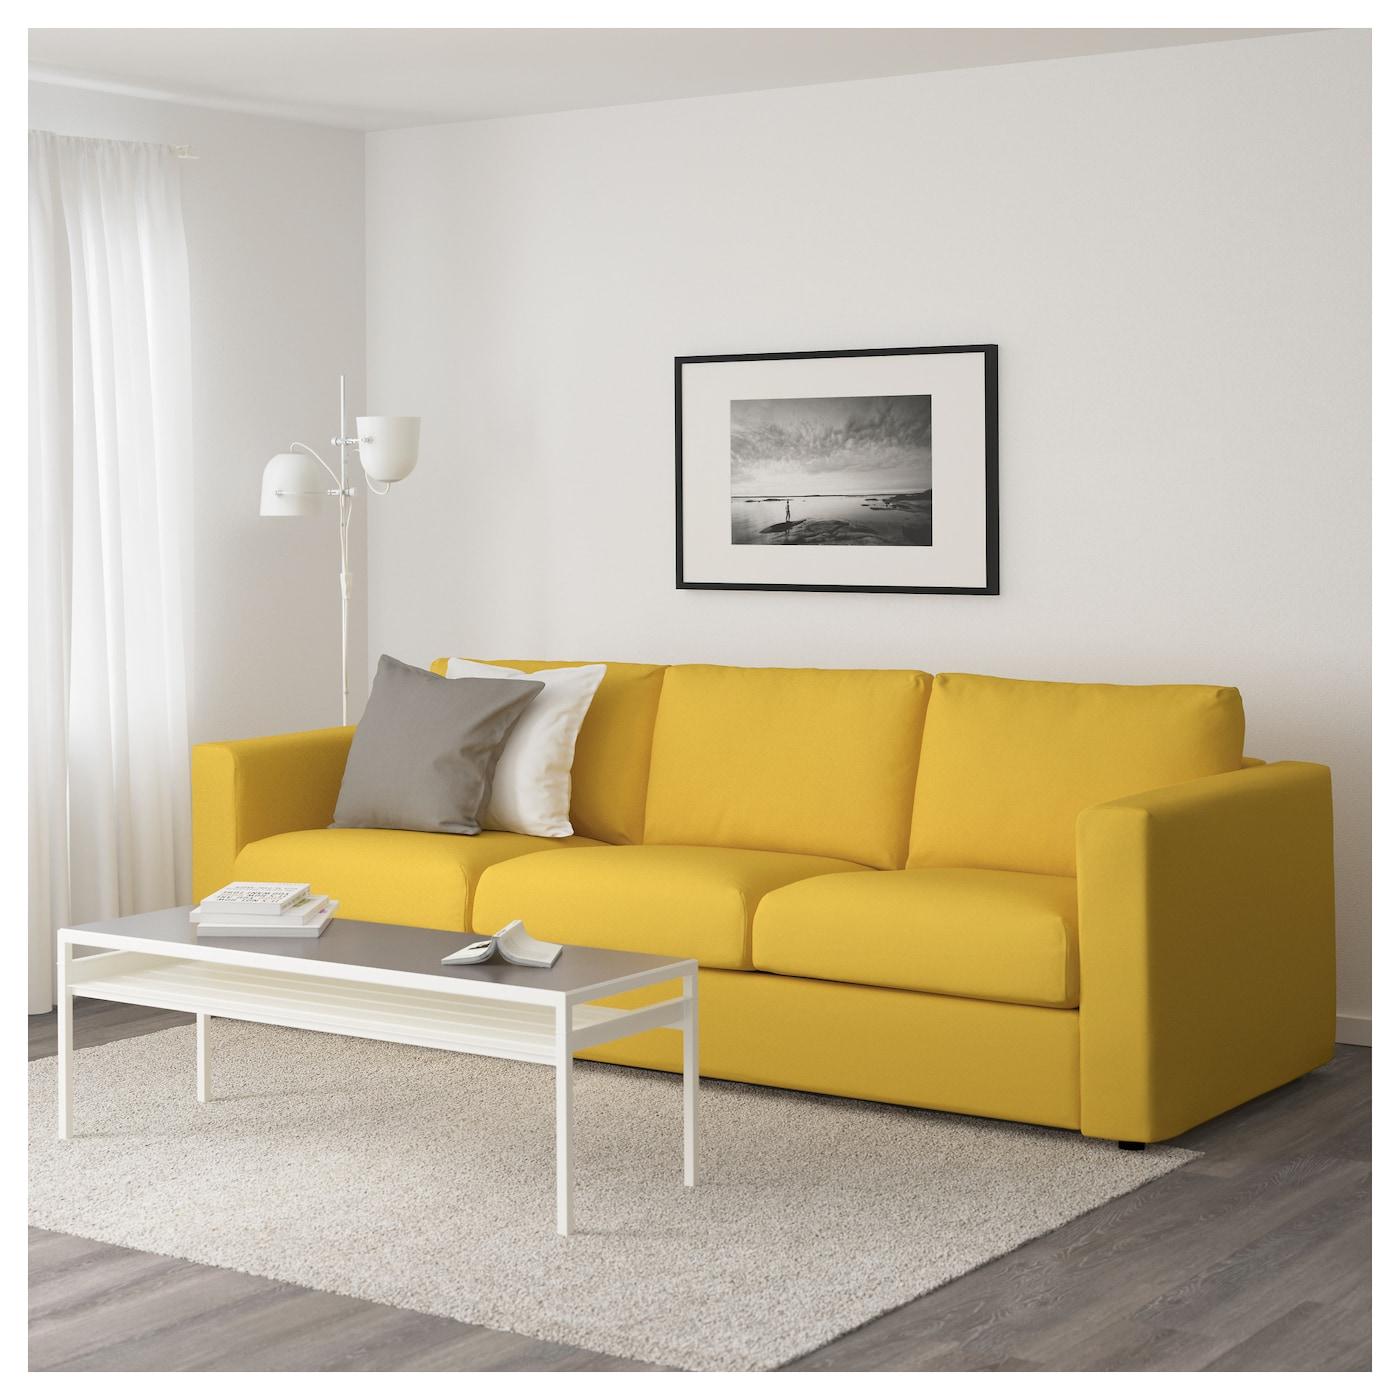 VIMLE 3-seat Sofa Gräsbo Golden-yellow